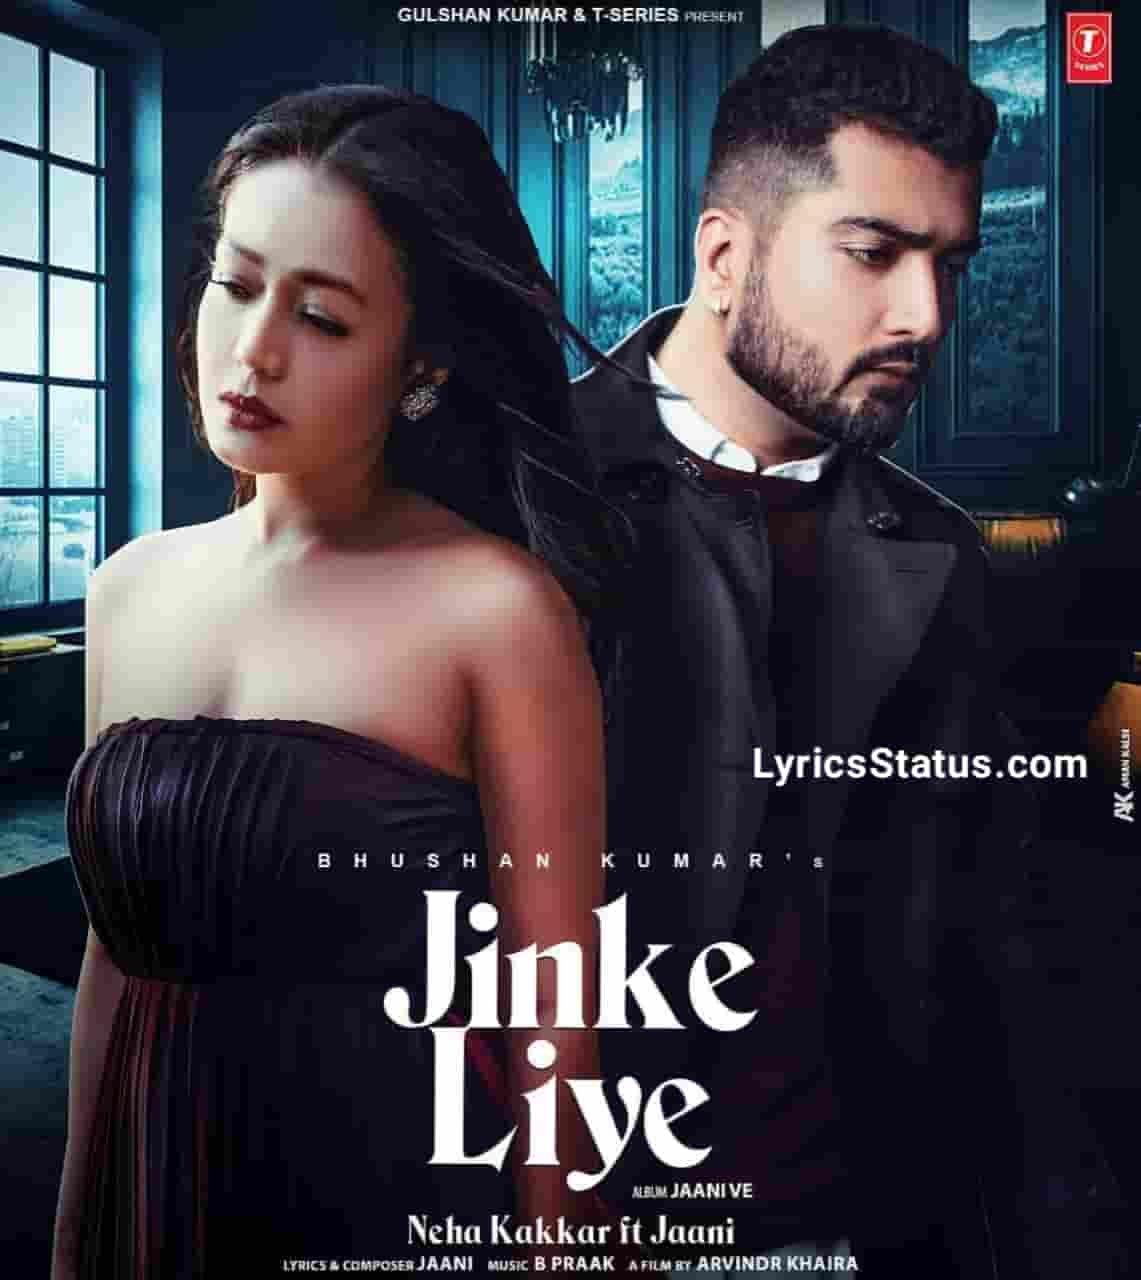 Neha Kakkar Jinke Liye Jaani Lyrics Status Download New Punjabi Song Jinke liye hum rote hain Woh kisi aur ki baahon mein sote hain status video